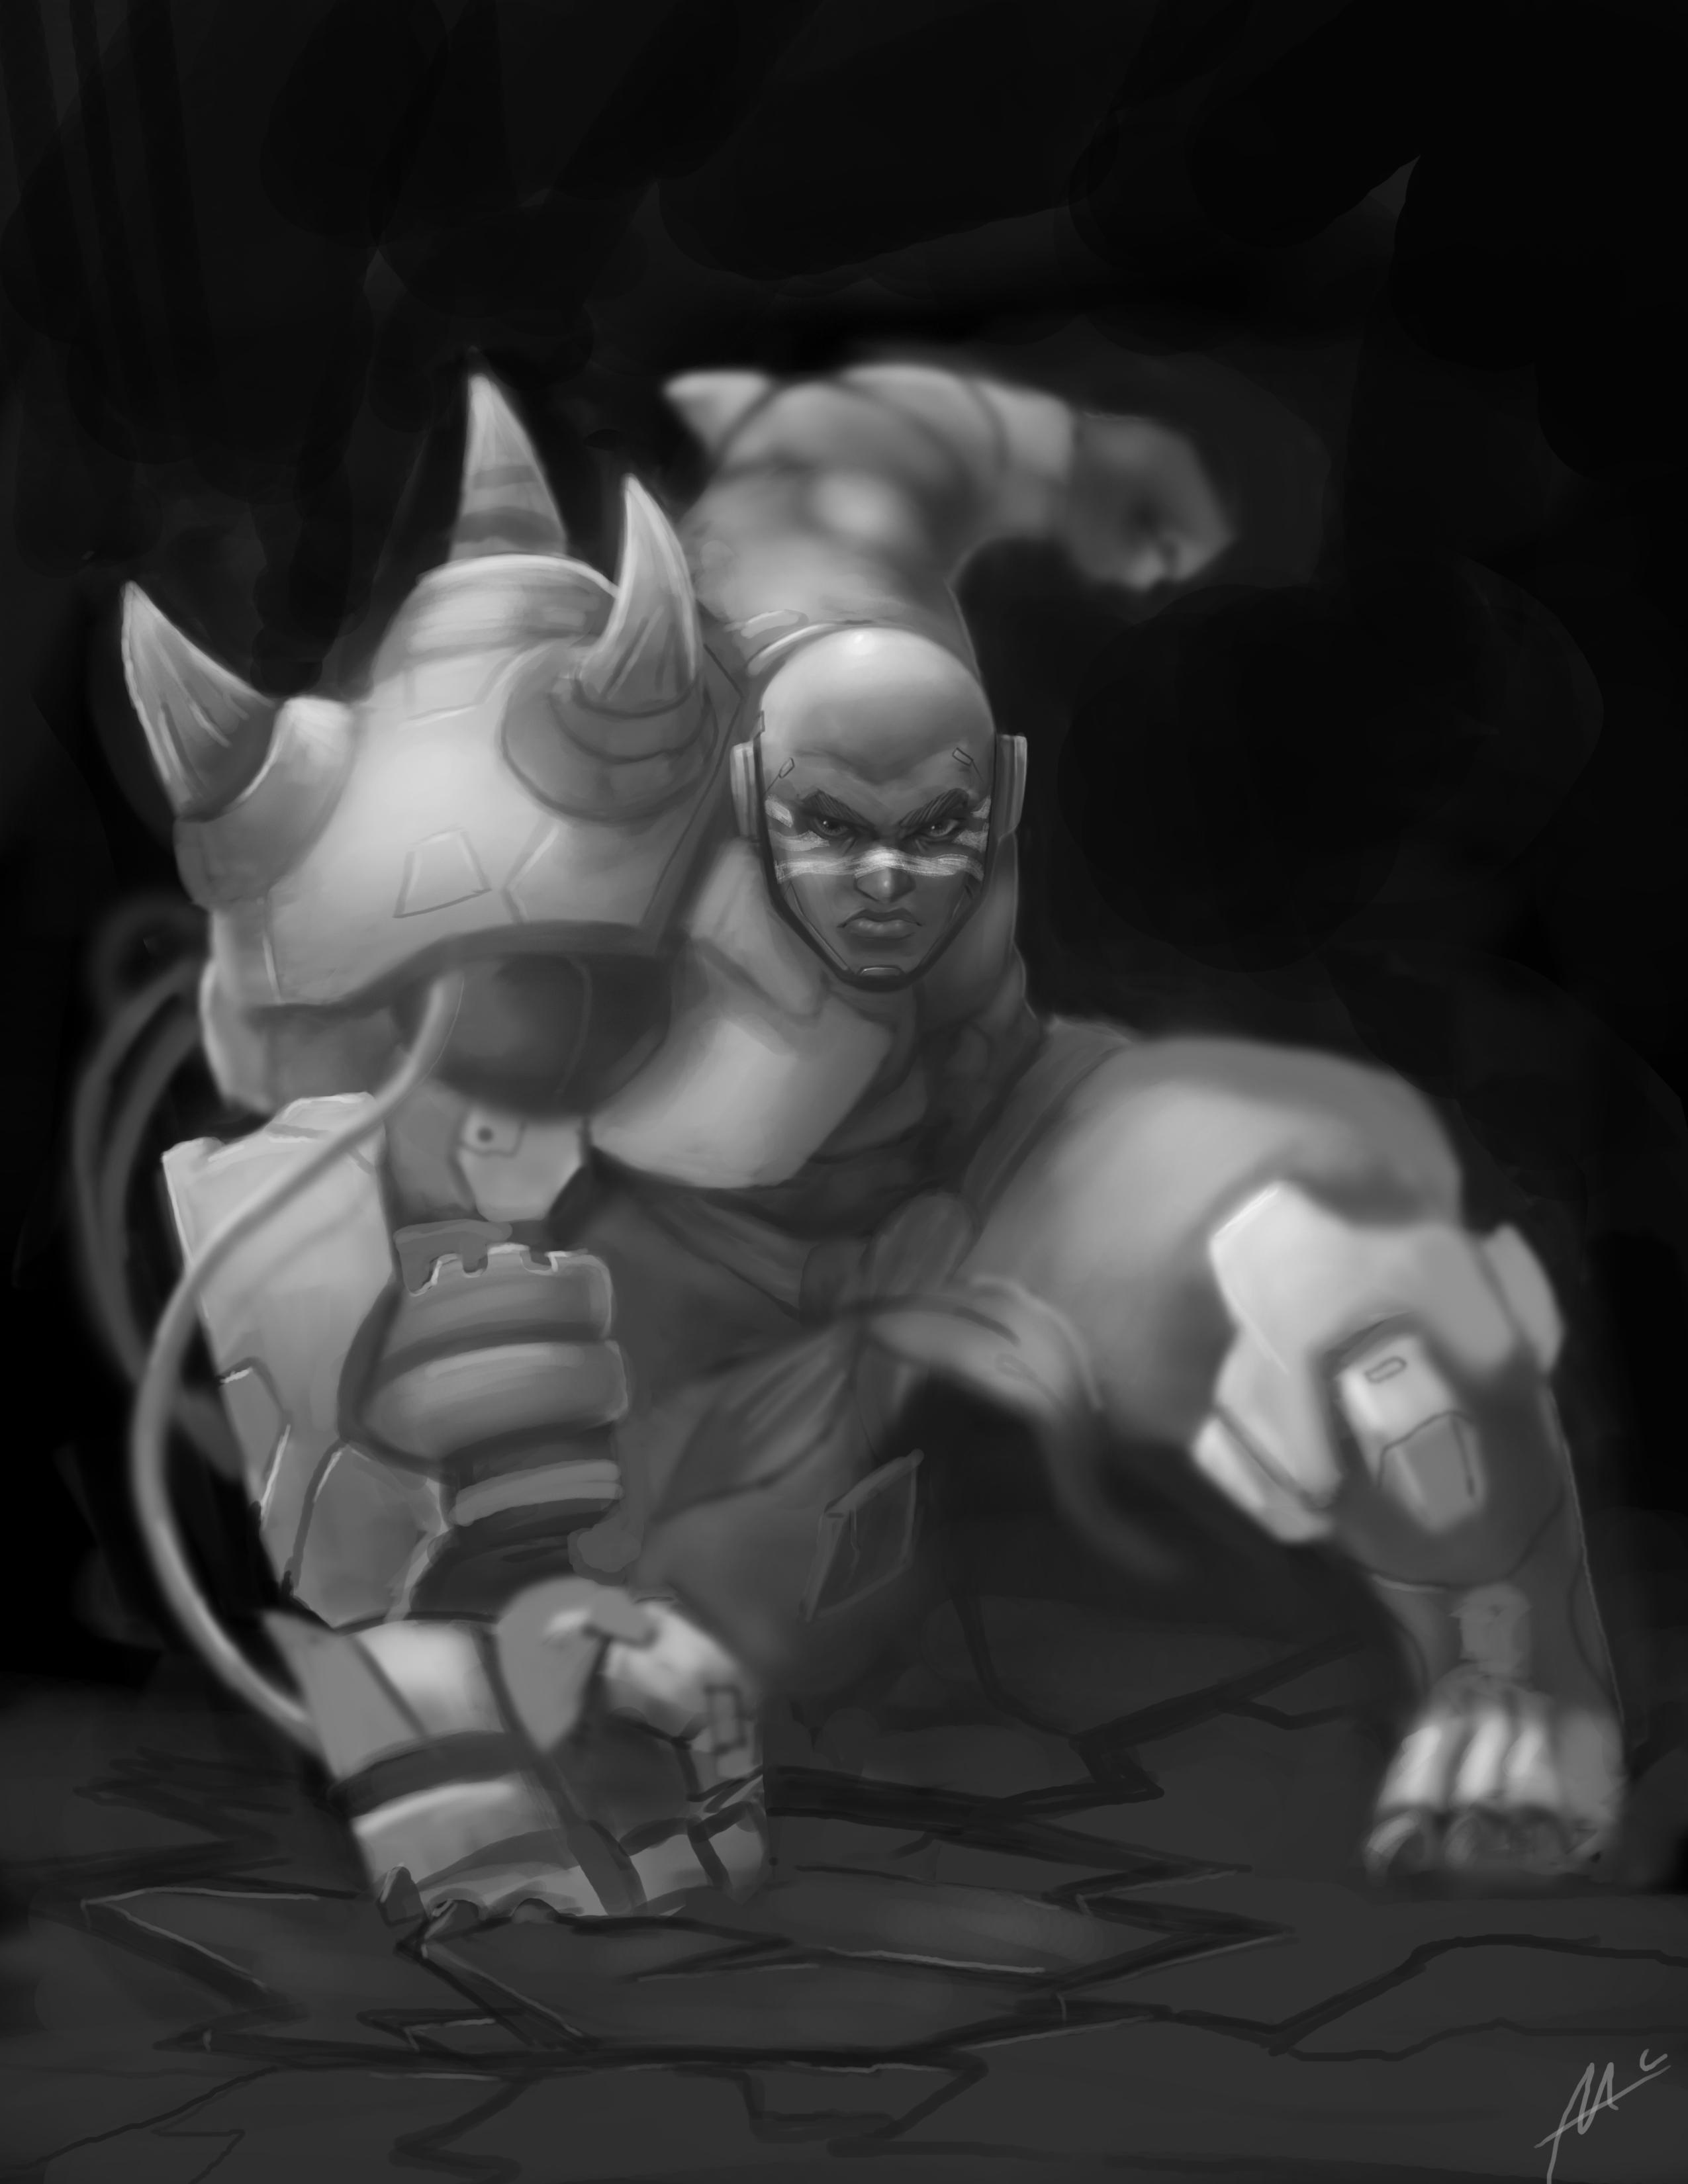 Doomfist Grayscale